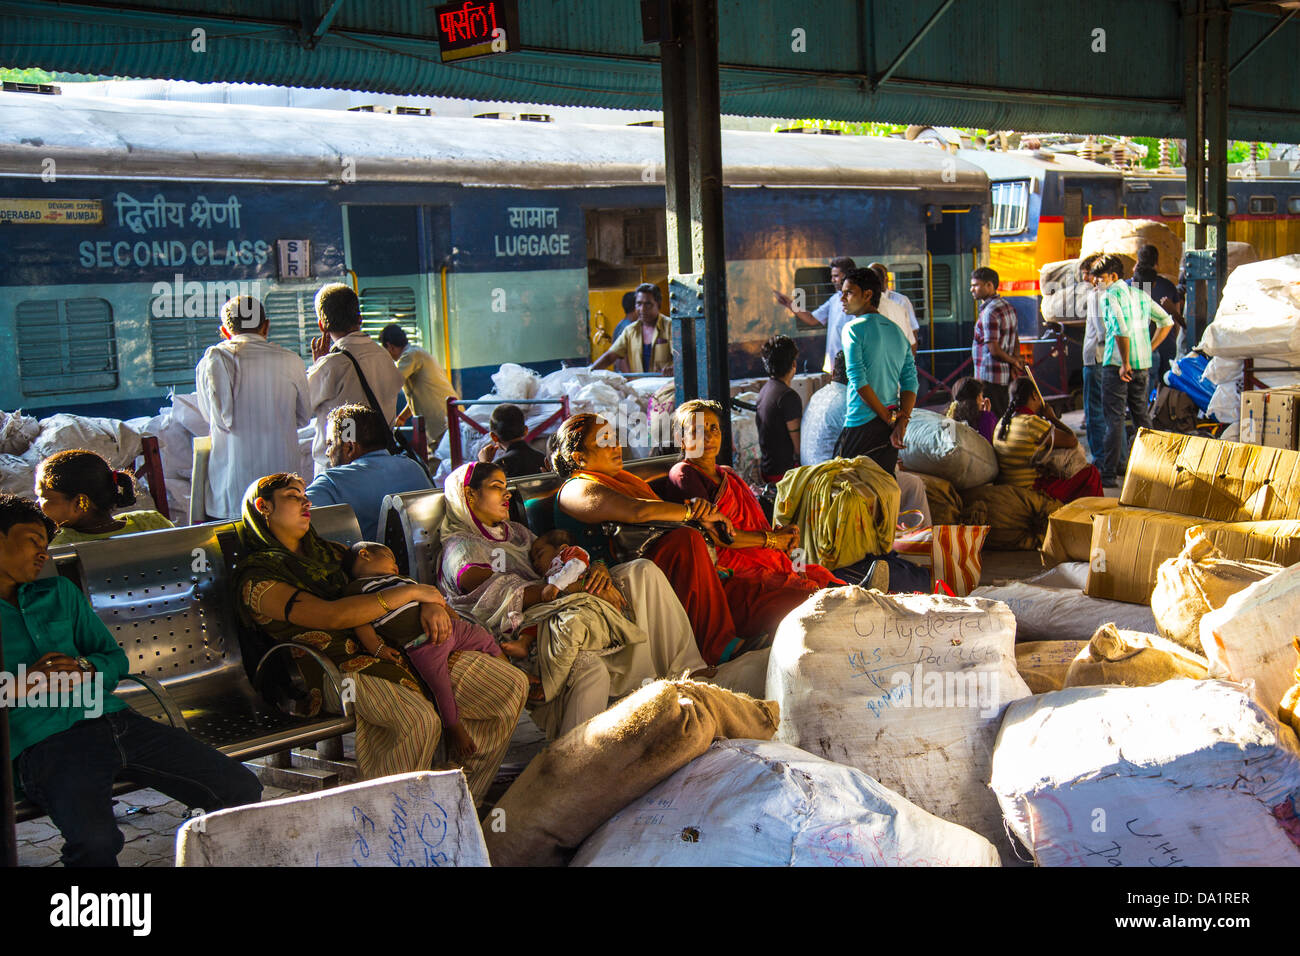 Plataforma abarrotado en Chattrapati Shivaji o Victoria Terminus, Mumbai, India Imagen De Stock